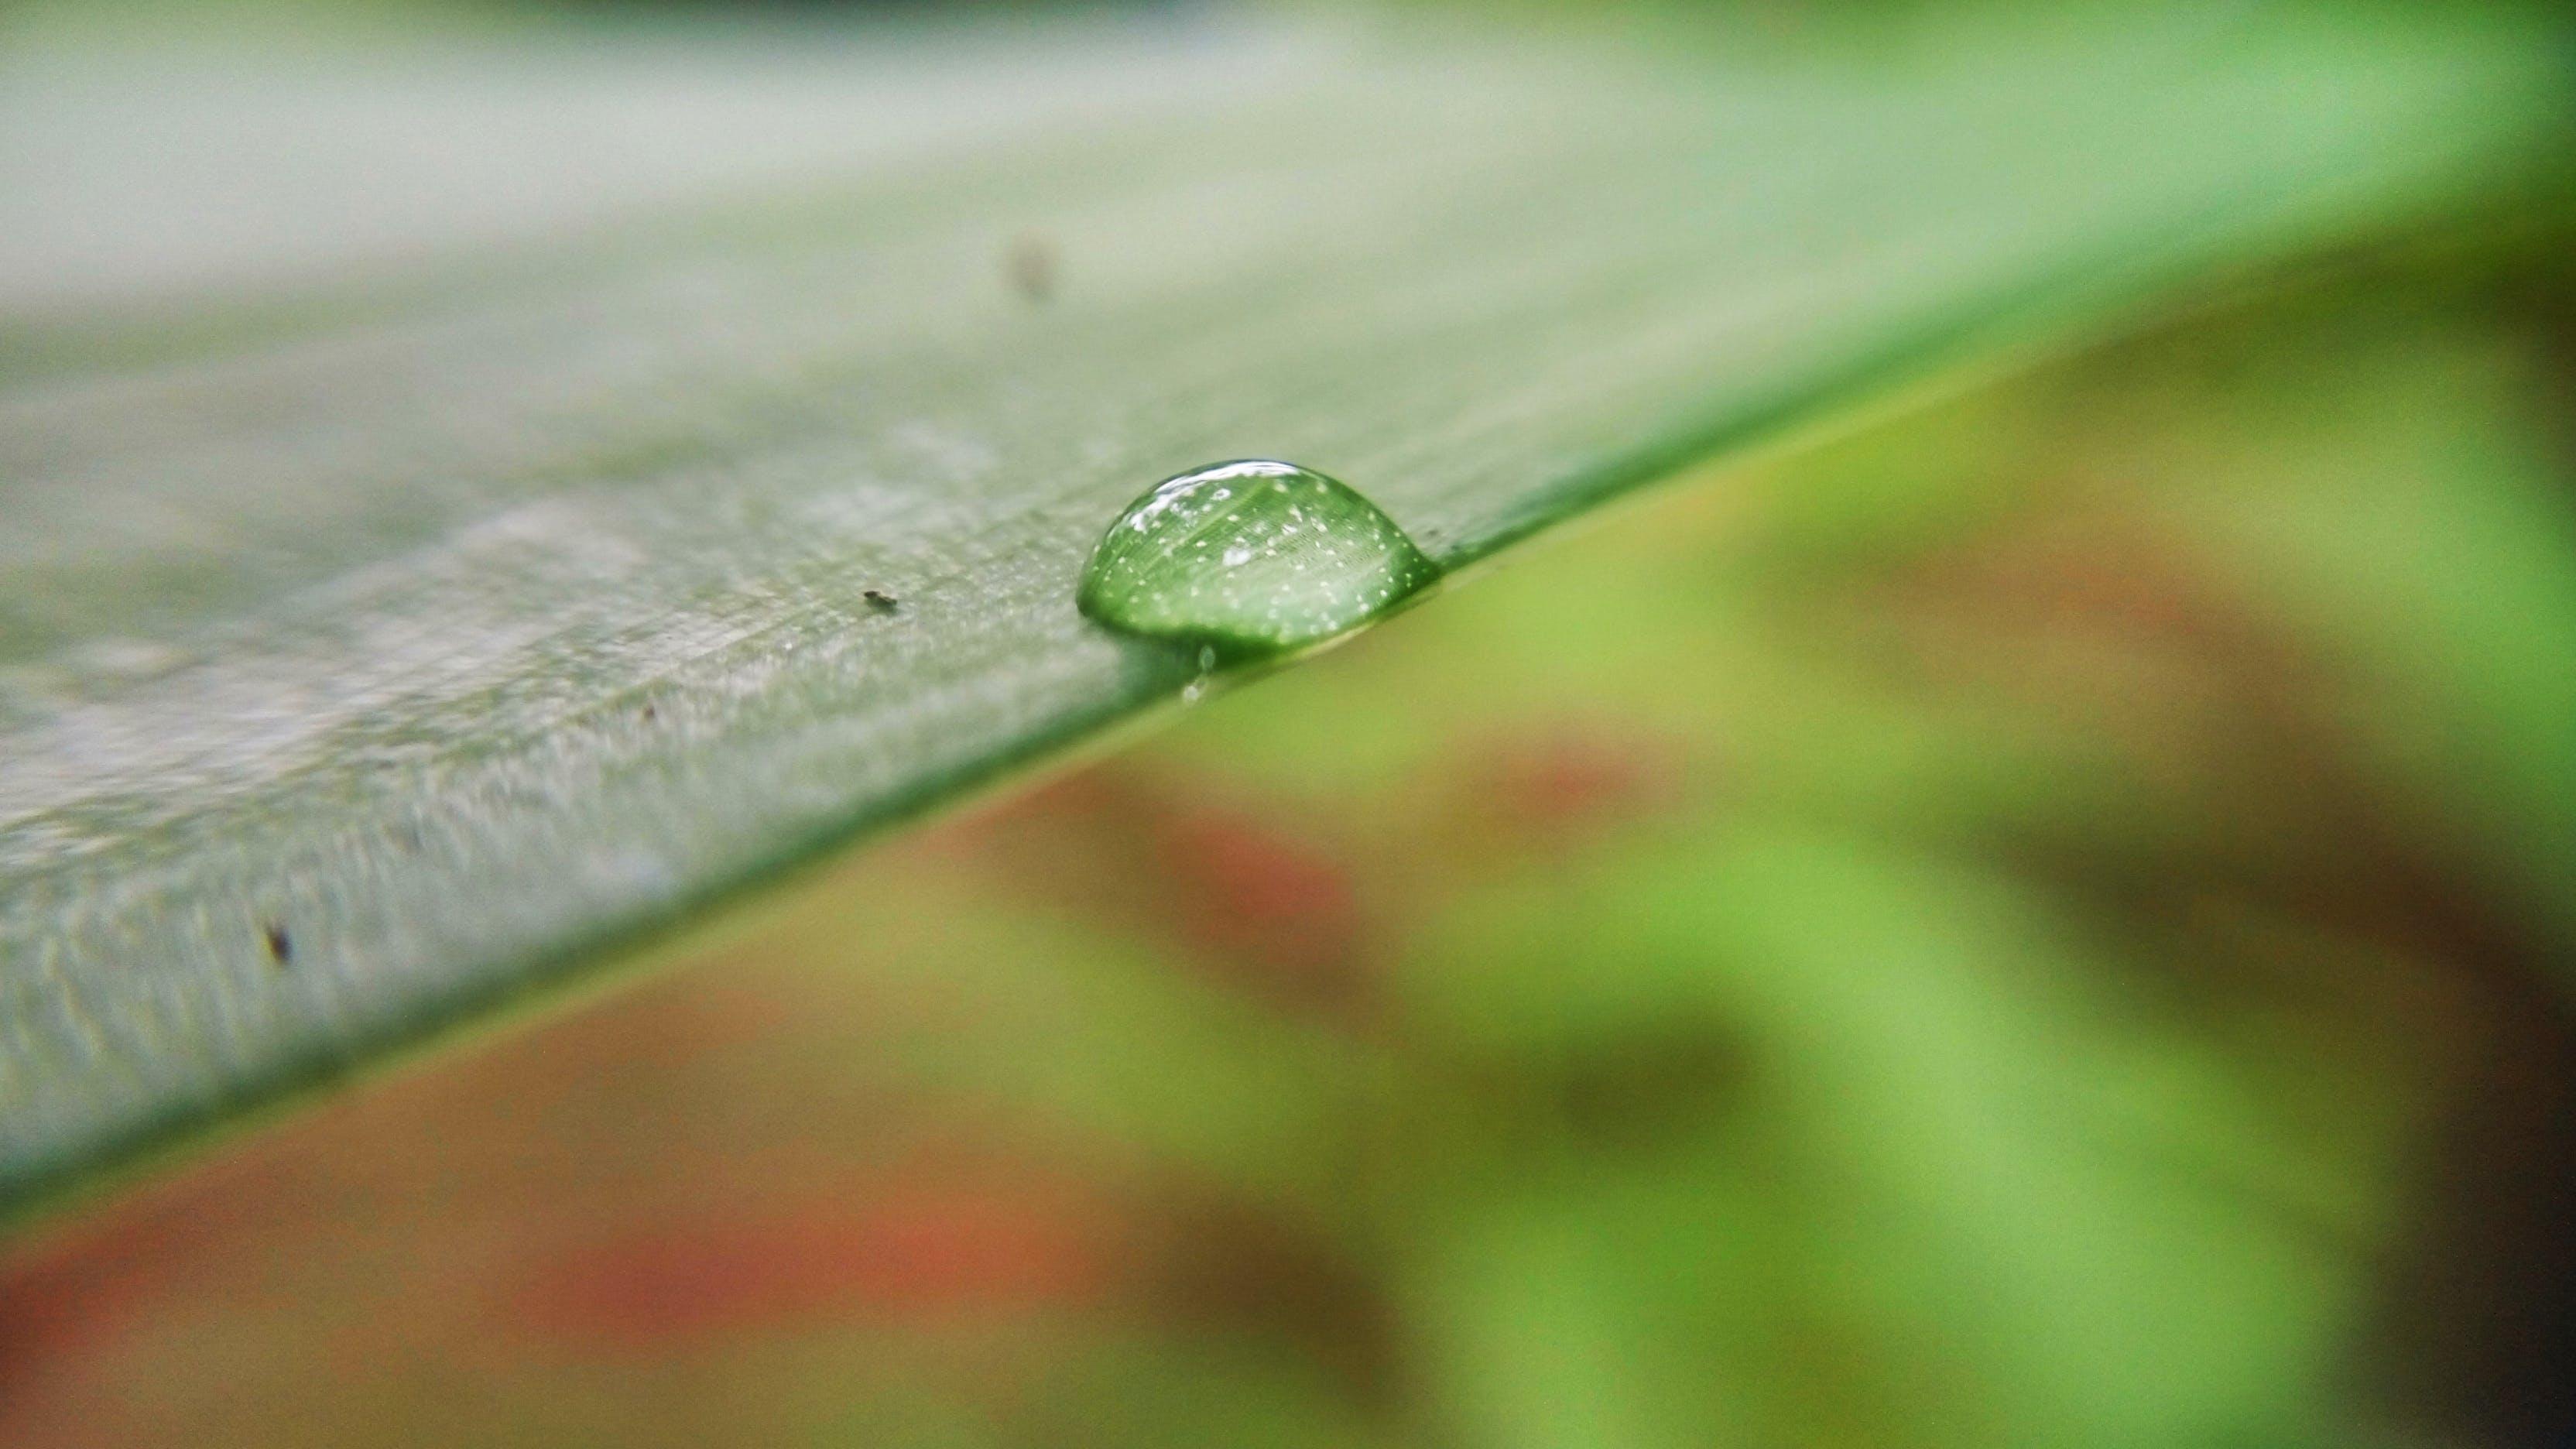 Water Drop on Leaf